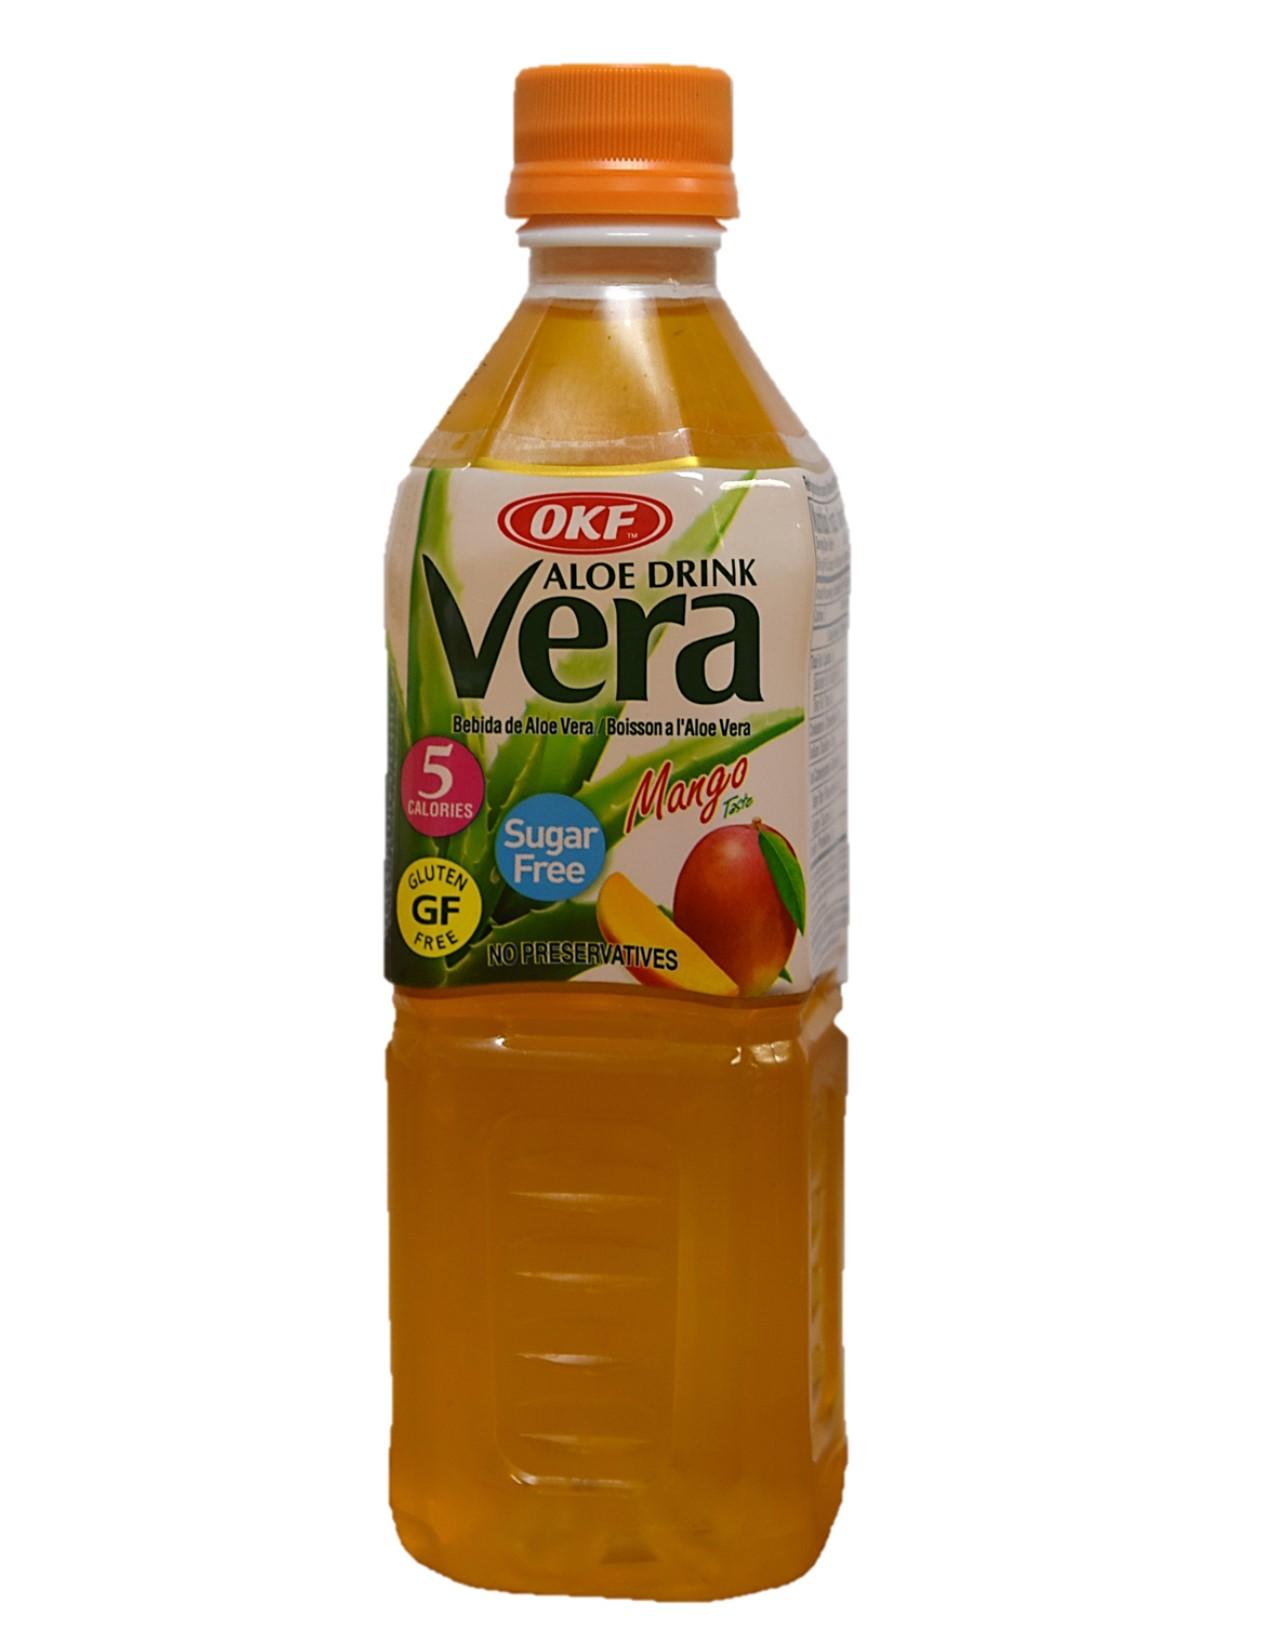 OKF Aloe Vera Mango - Sugar Free 500ml